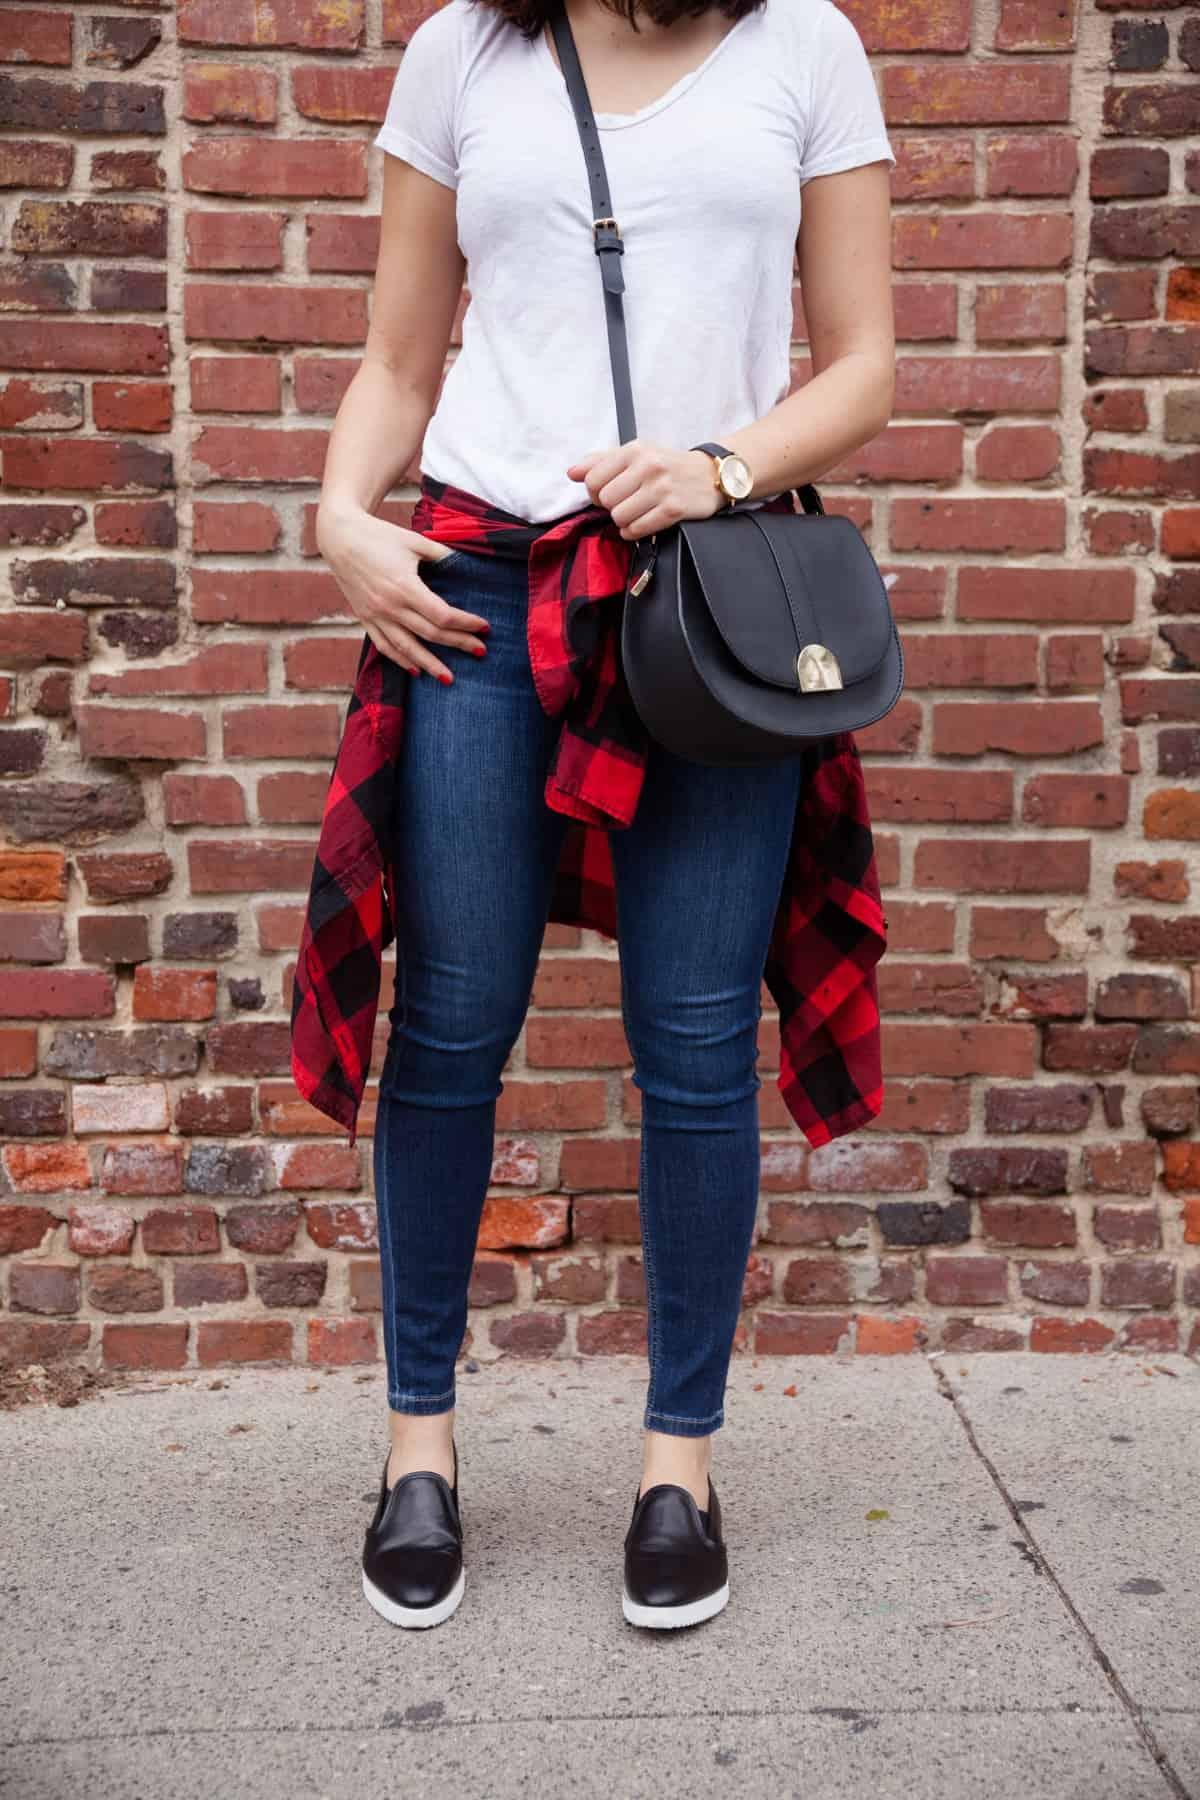 buffalo plaid outfit ideas - @mystylevita - 1 (3)